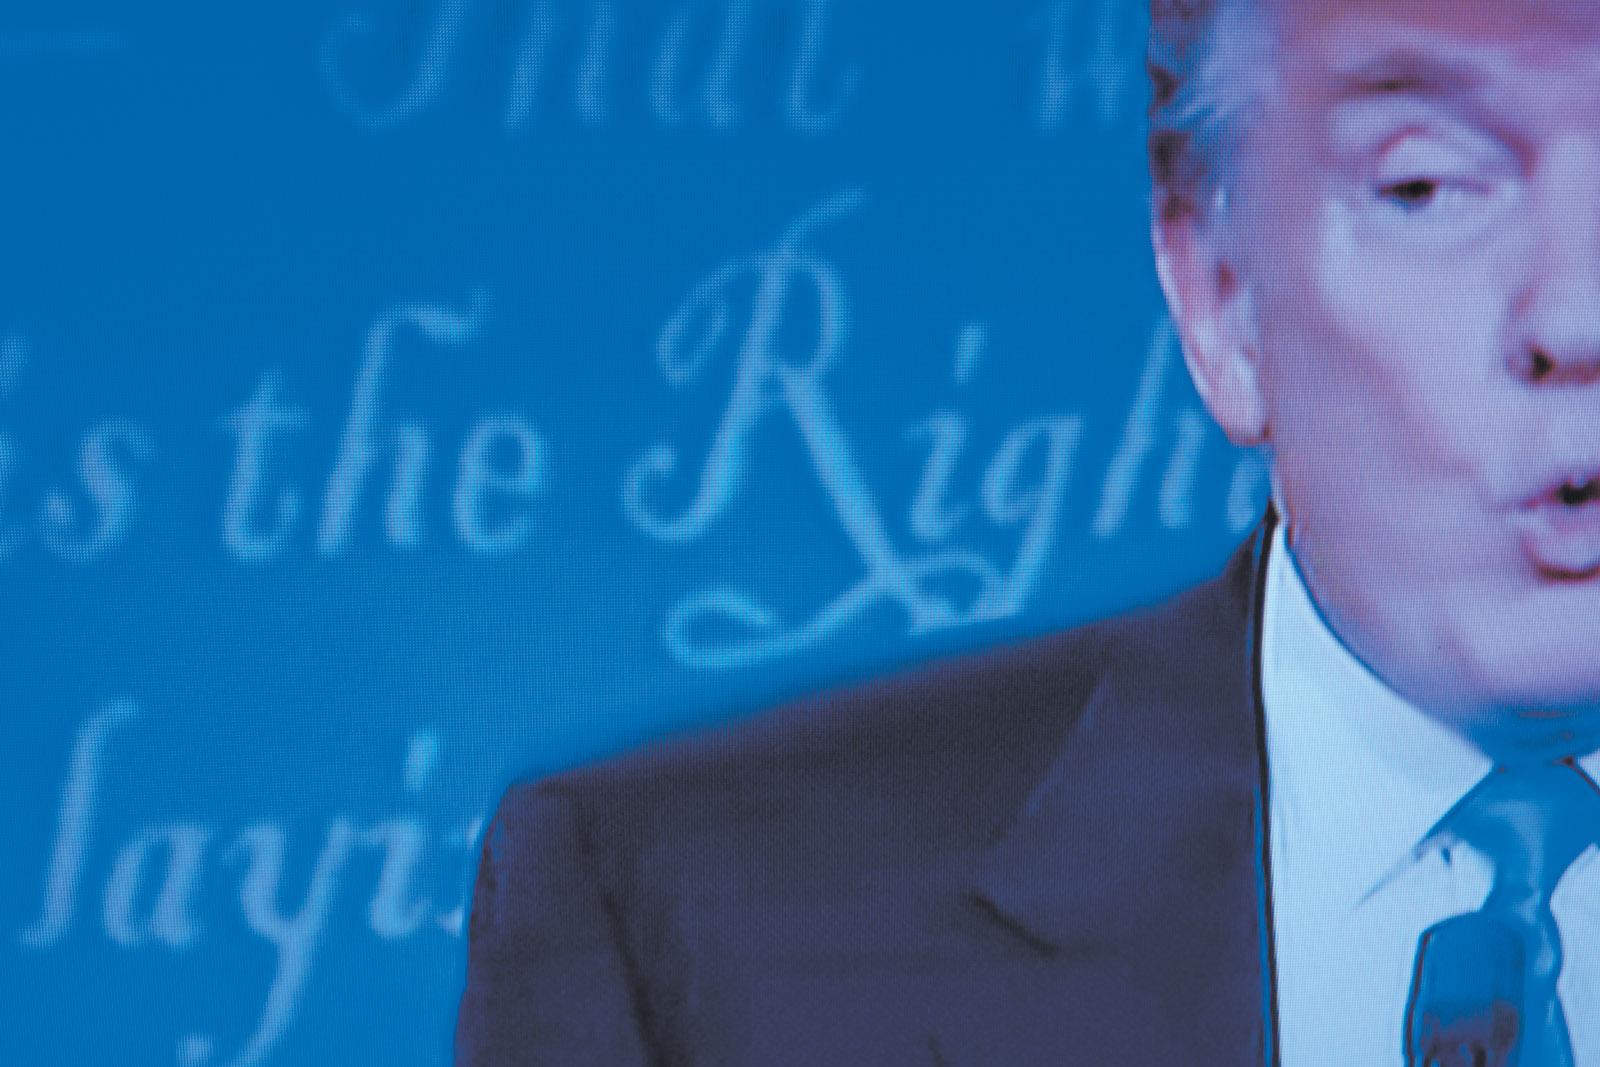 Donald Trump at the first presidential debate, Hofstra University, Hempstead, New York, September 26, 2016